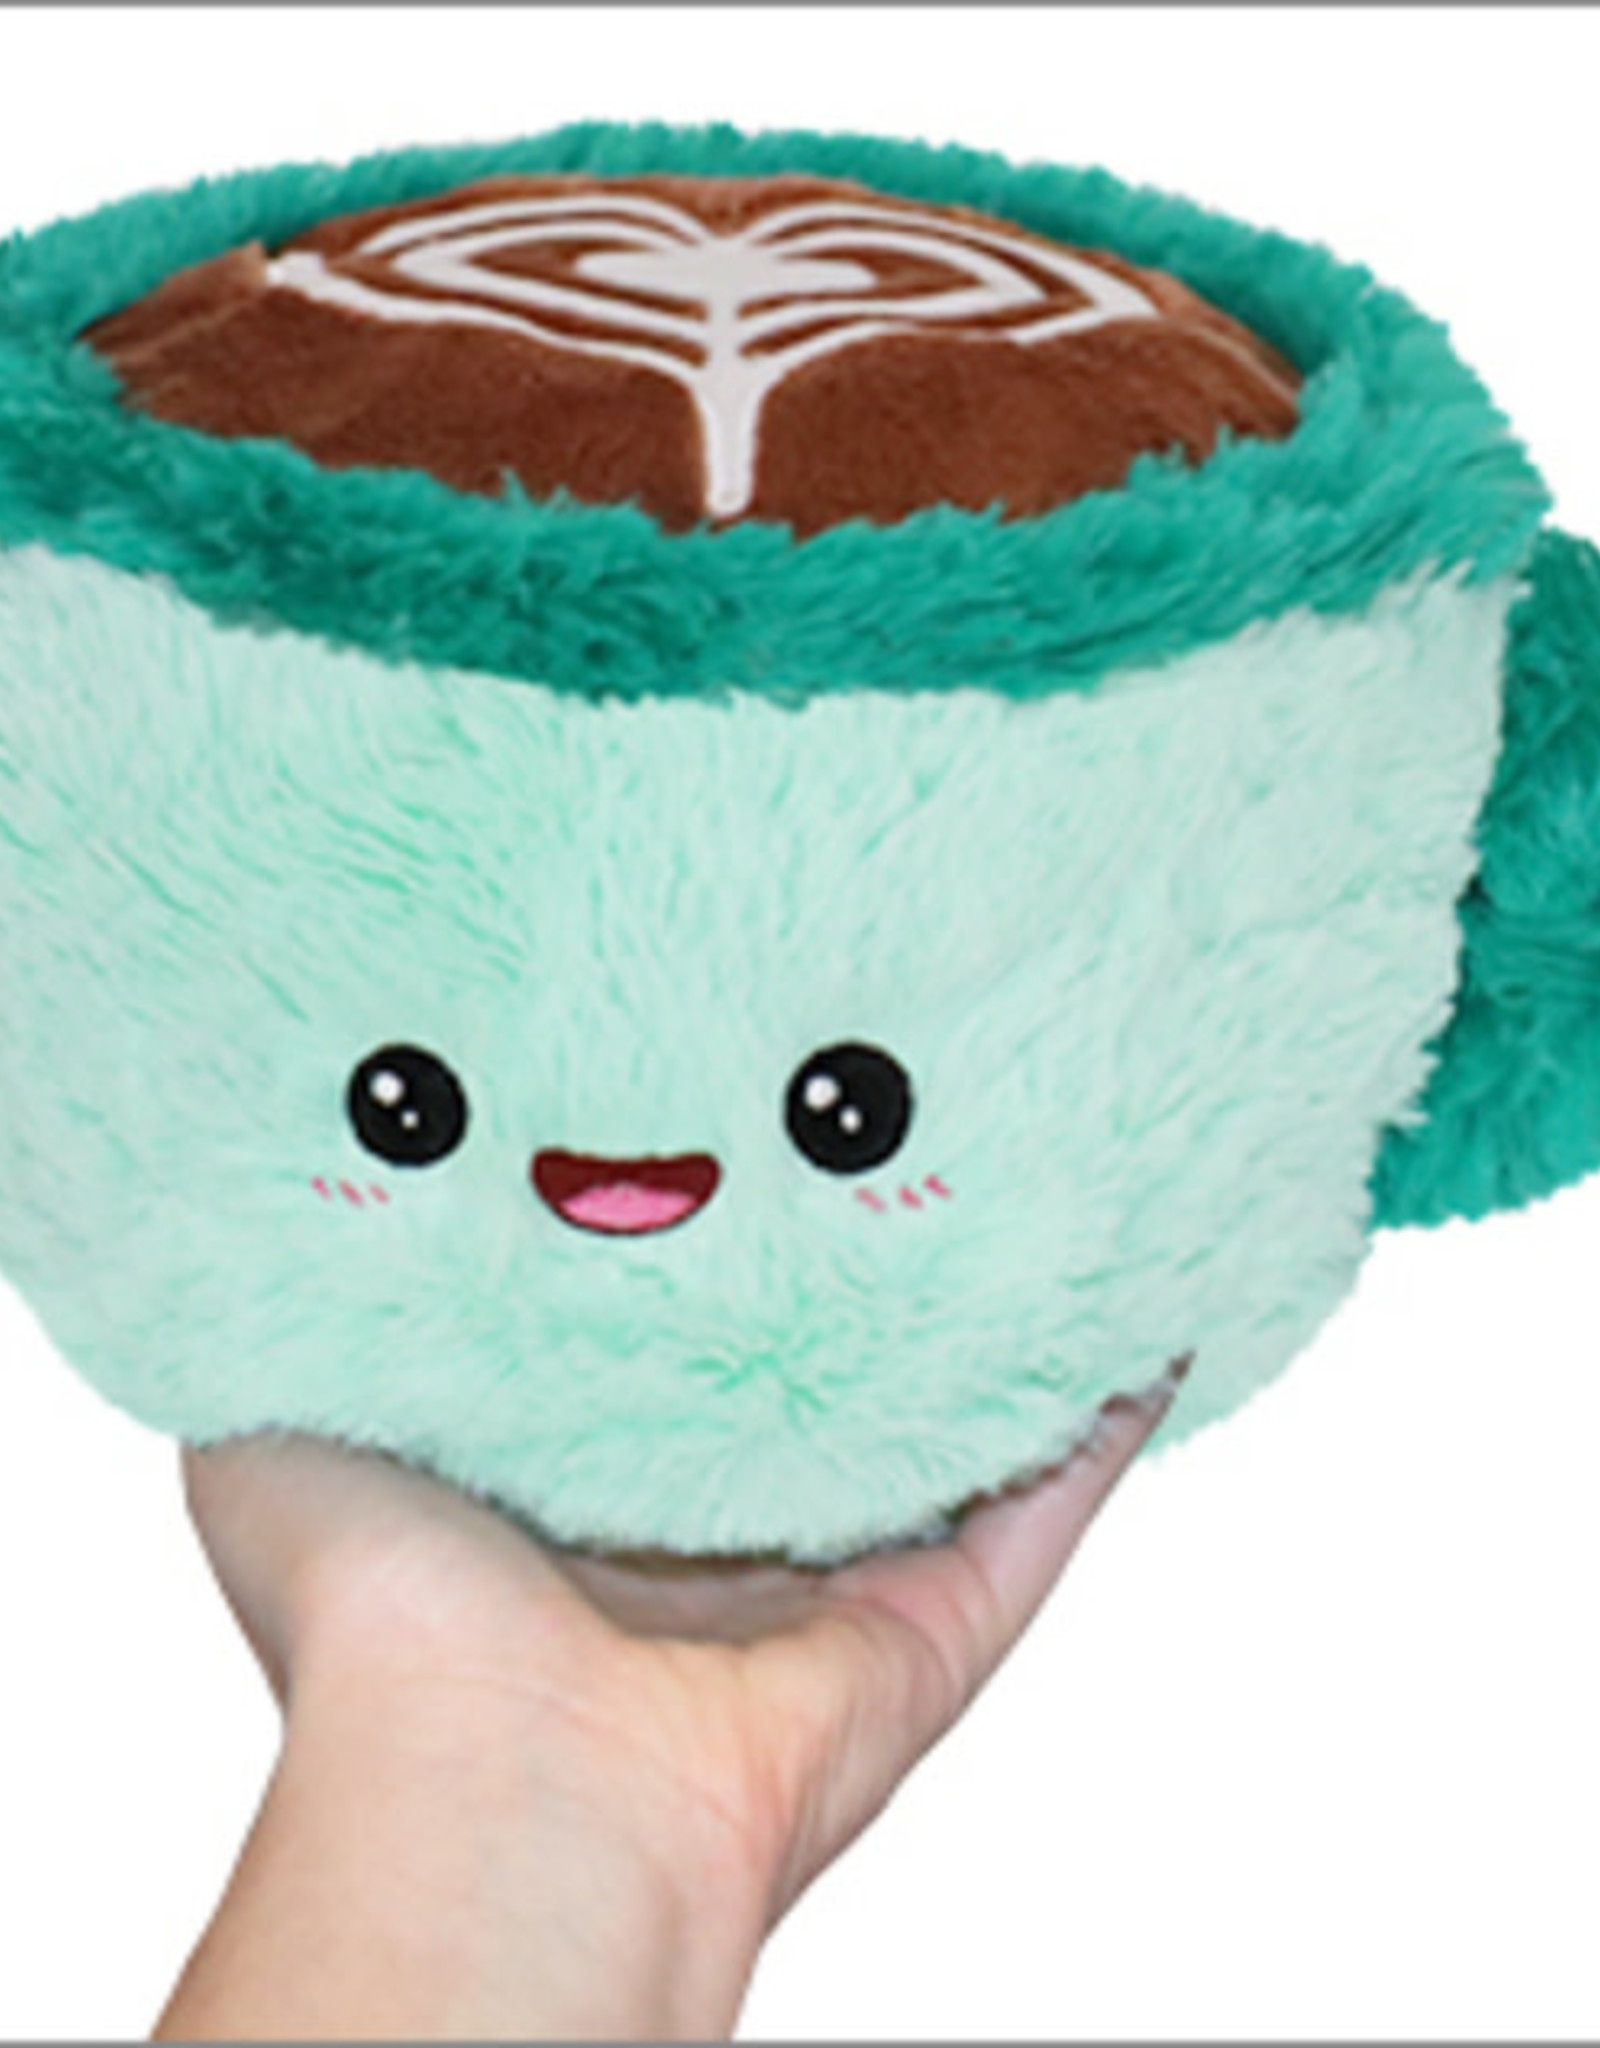 Squishable Mini Comfort Food Latte